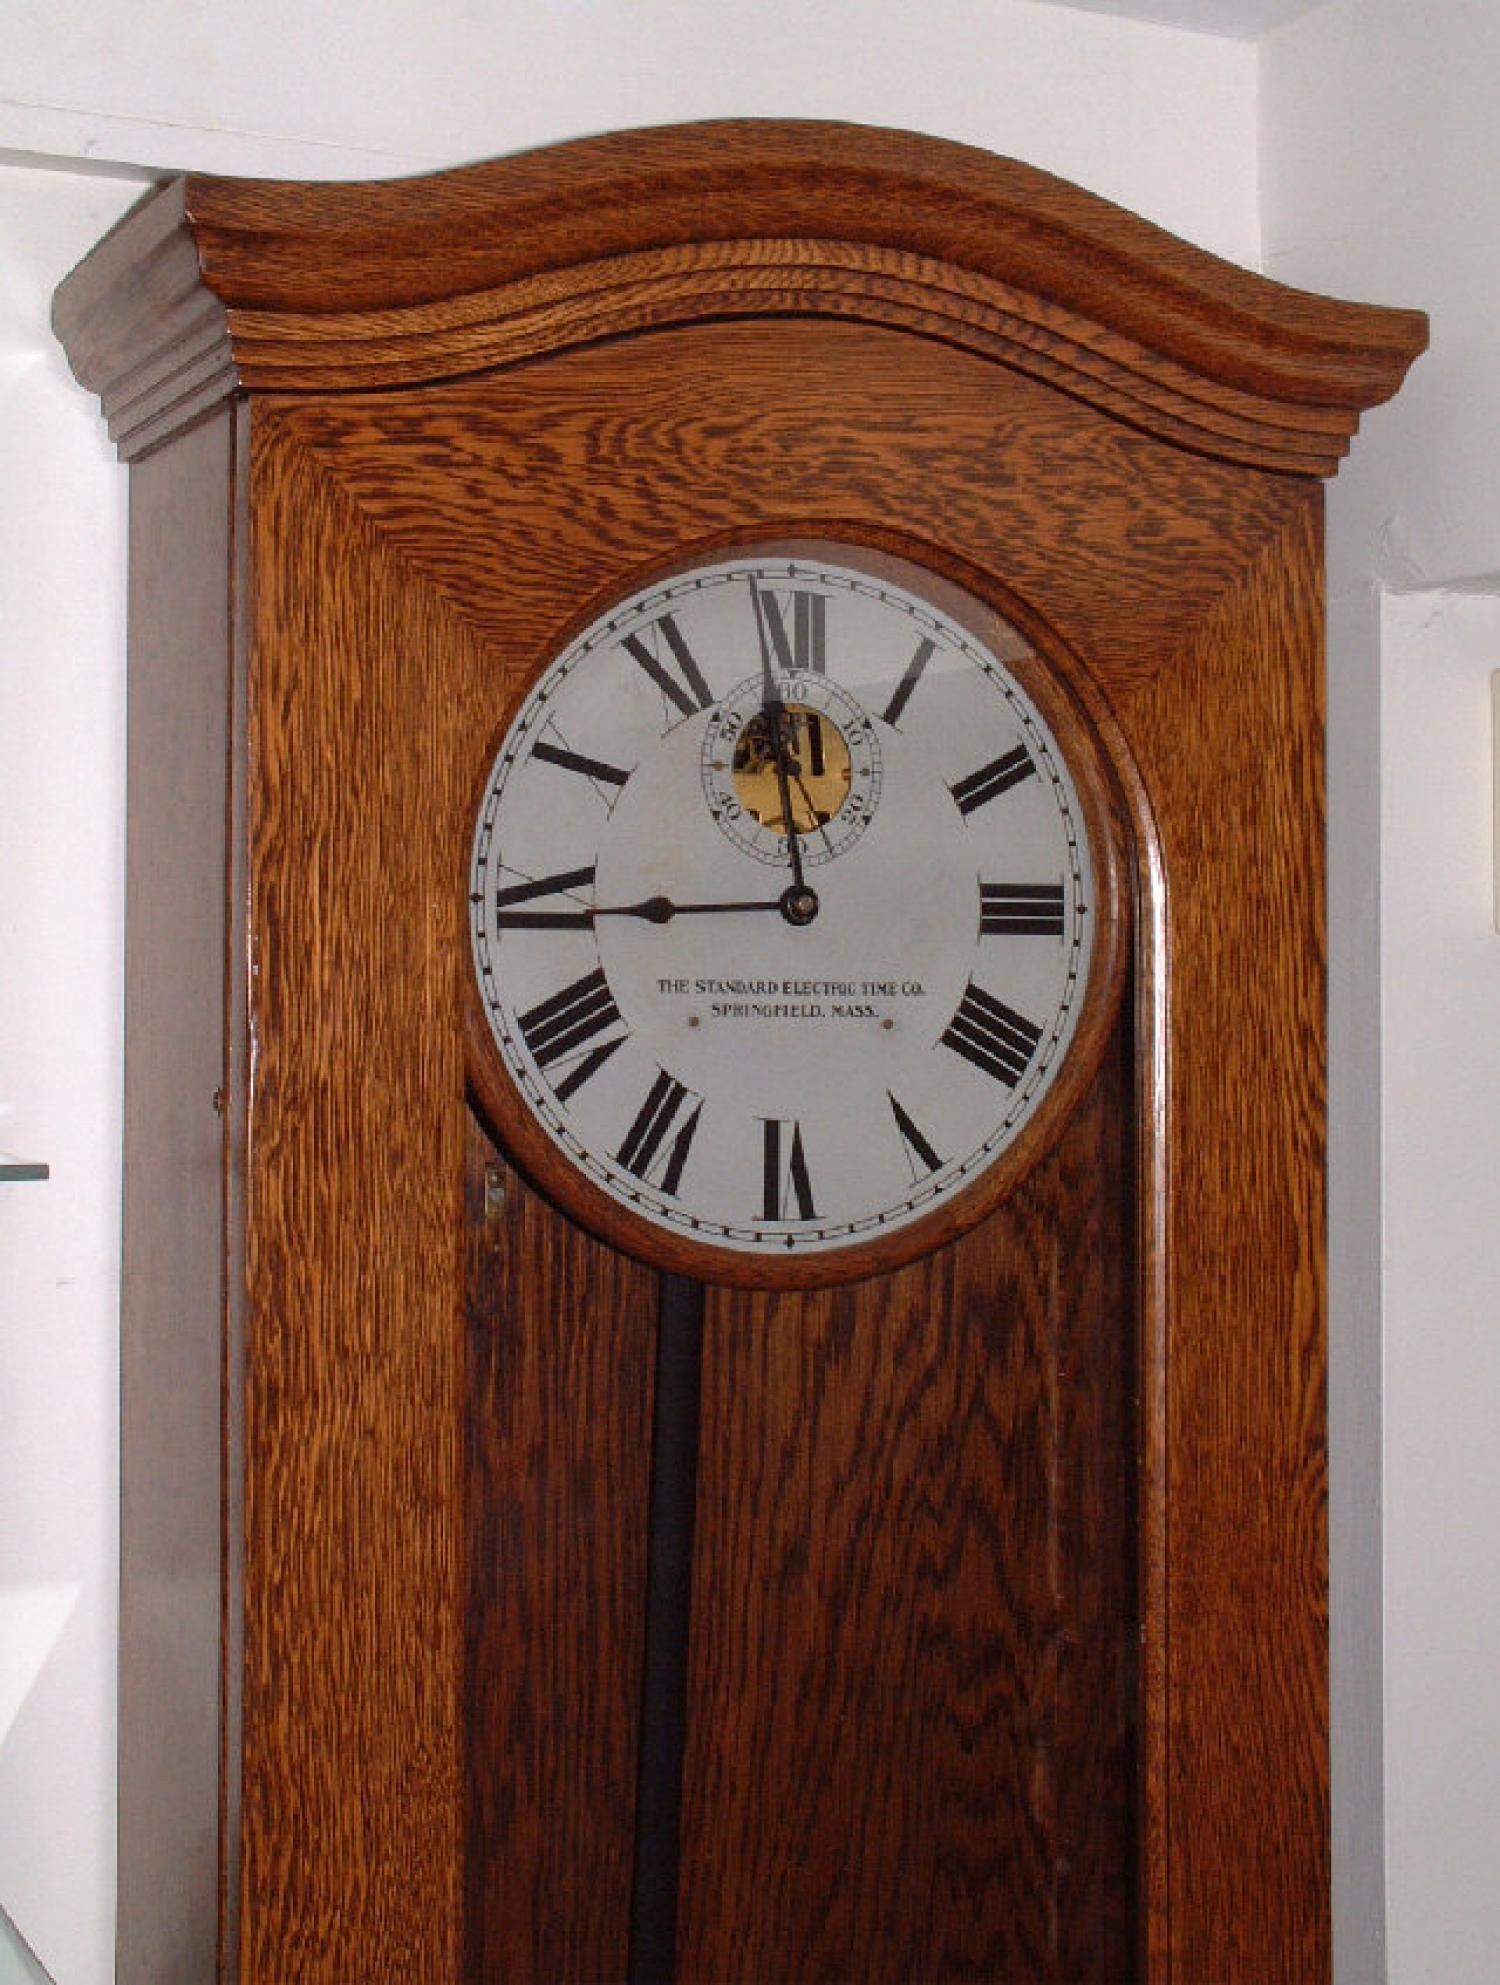 Antique Standard Electric regulator clock